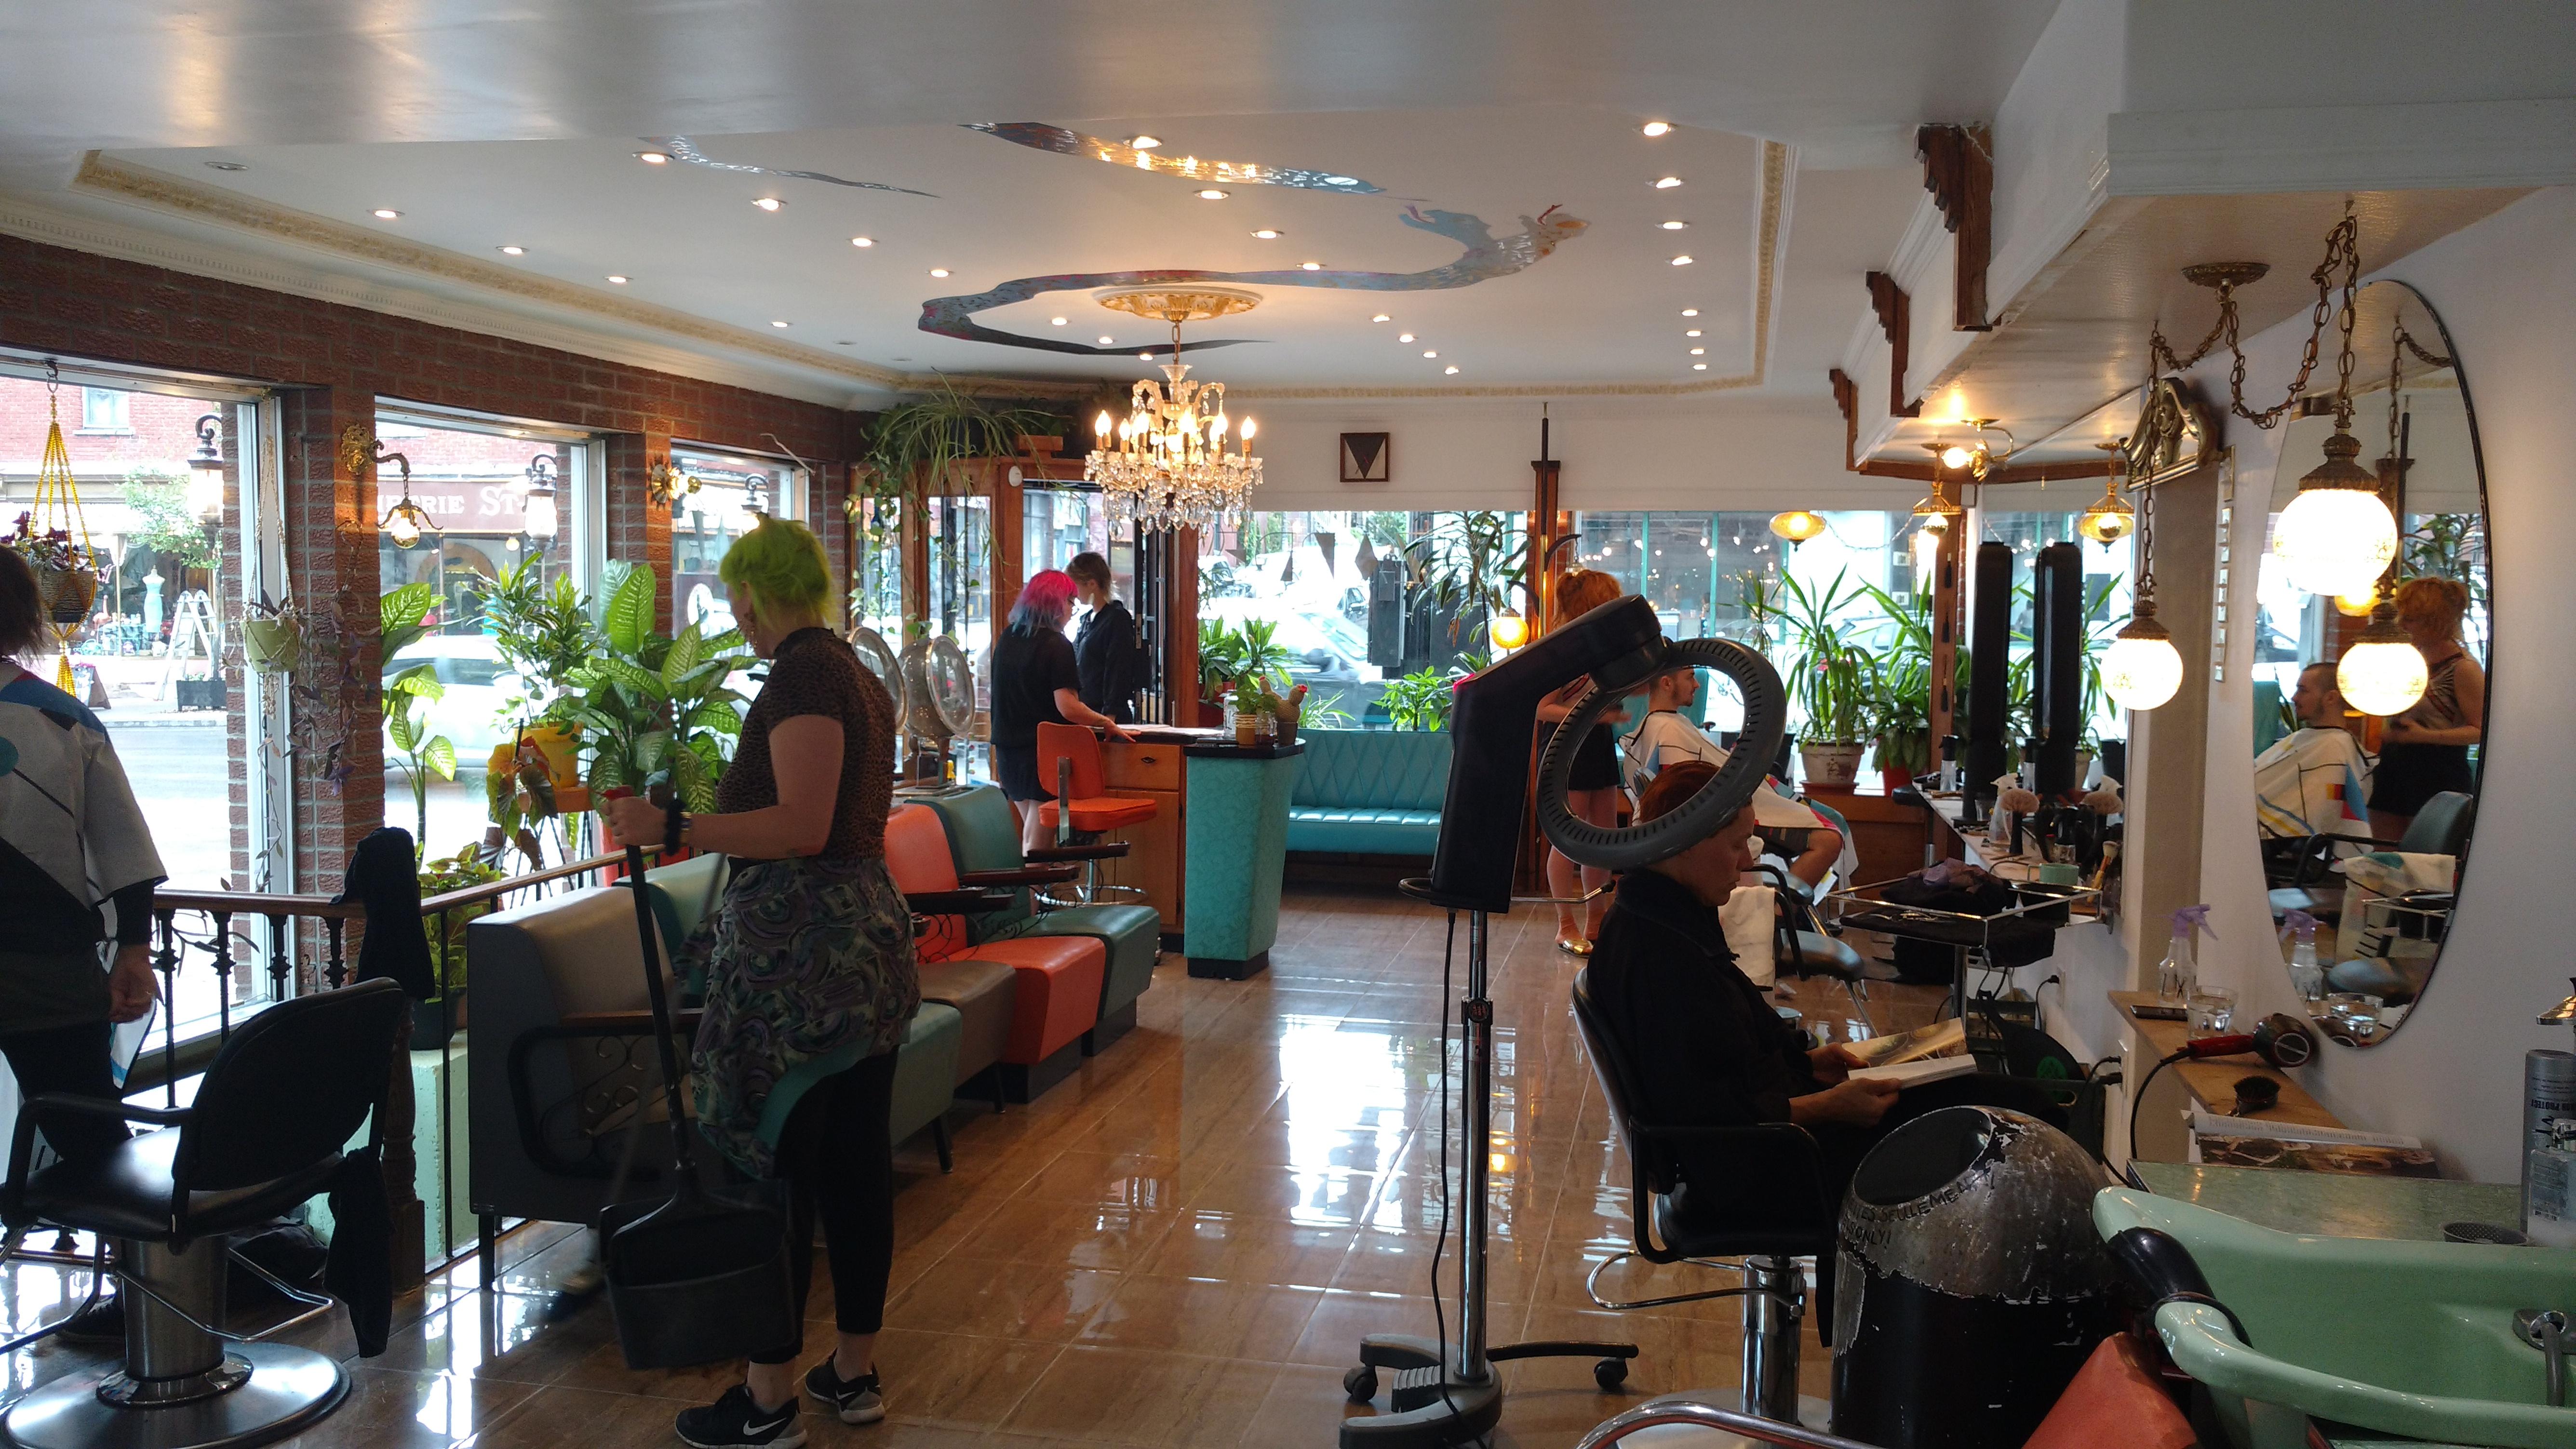 Bizarde sdbsl boulevard saint laurent - Salon coiffure rue st laurent ...